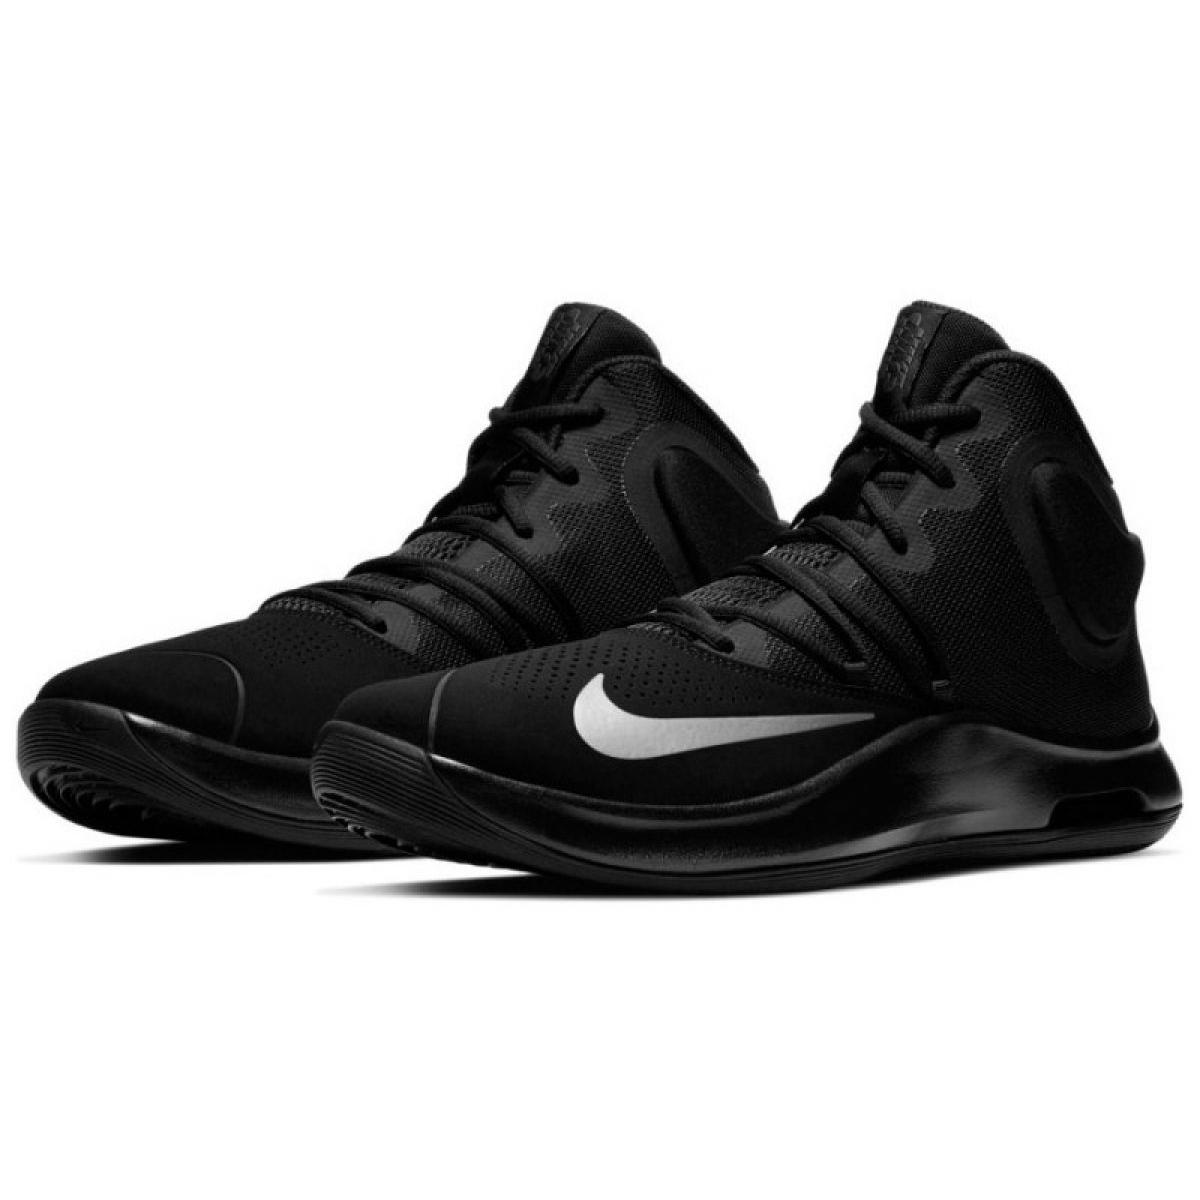 Nike Air Versitile IV AT1199 400